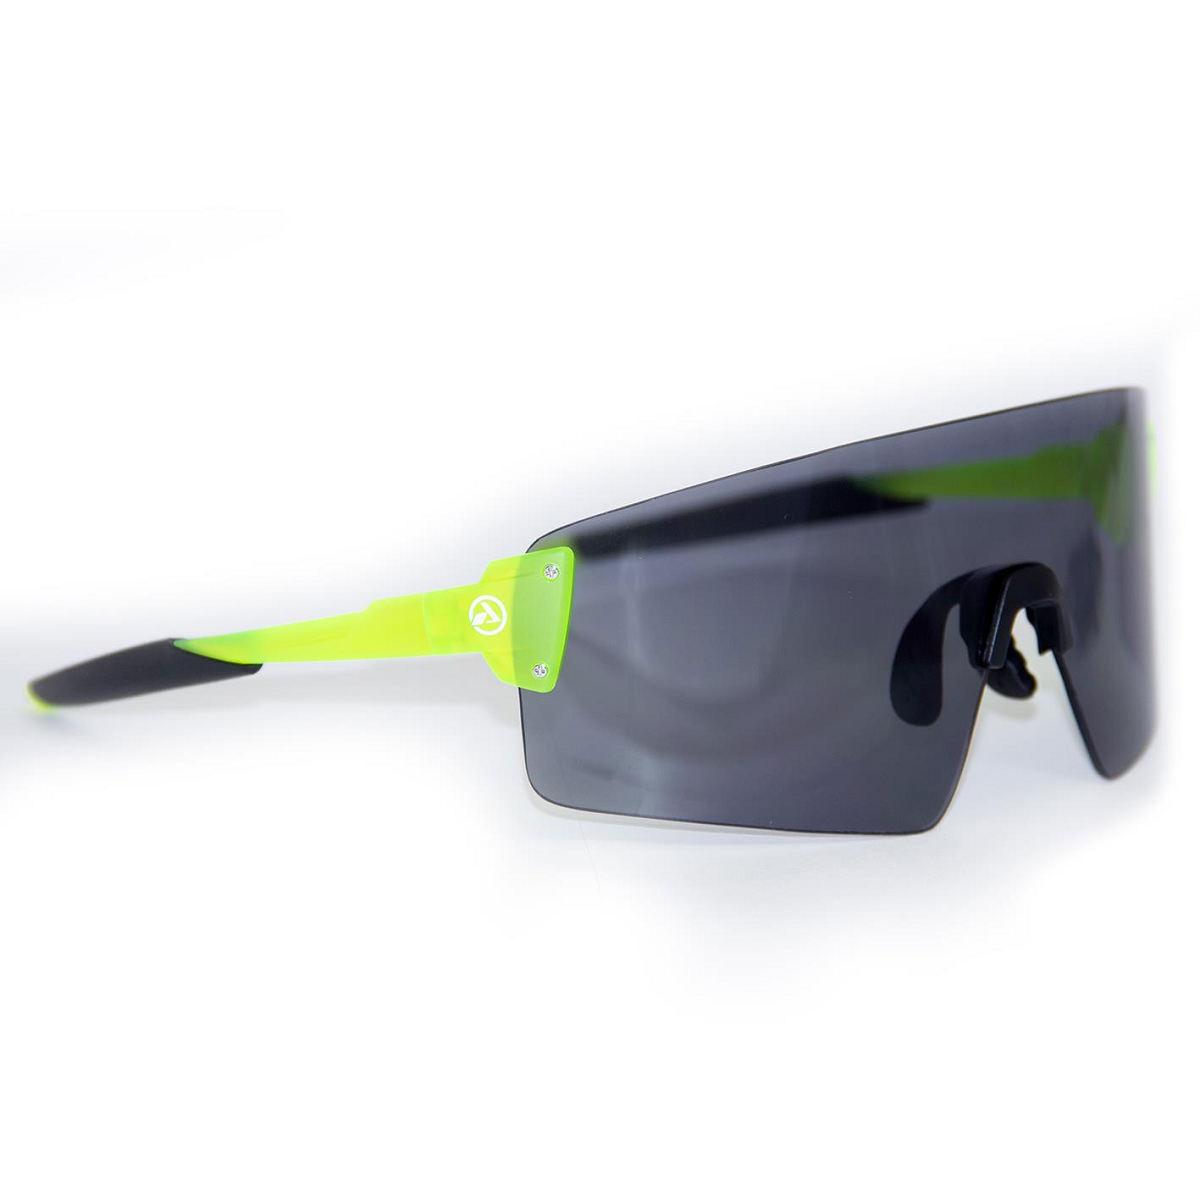 Oculos Absolute Prime Ex Neon Lente Fume